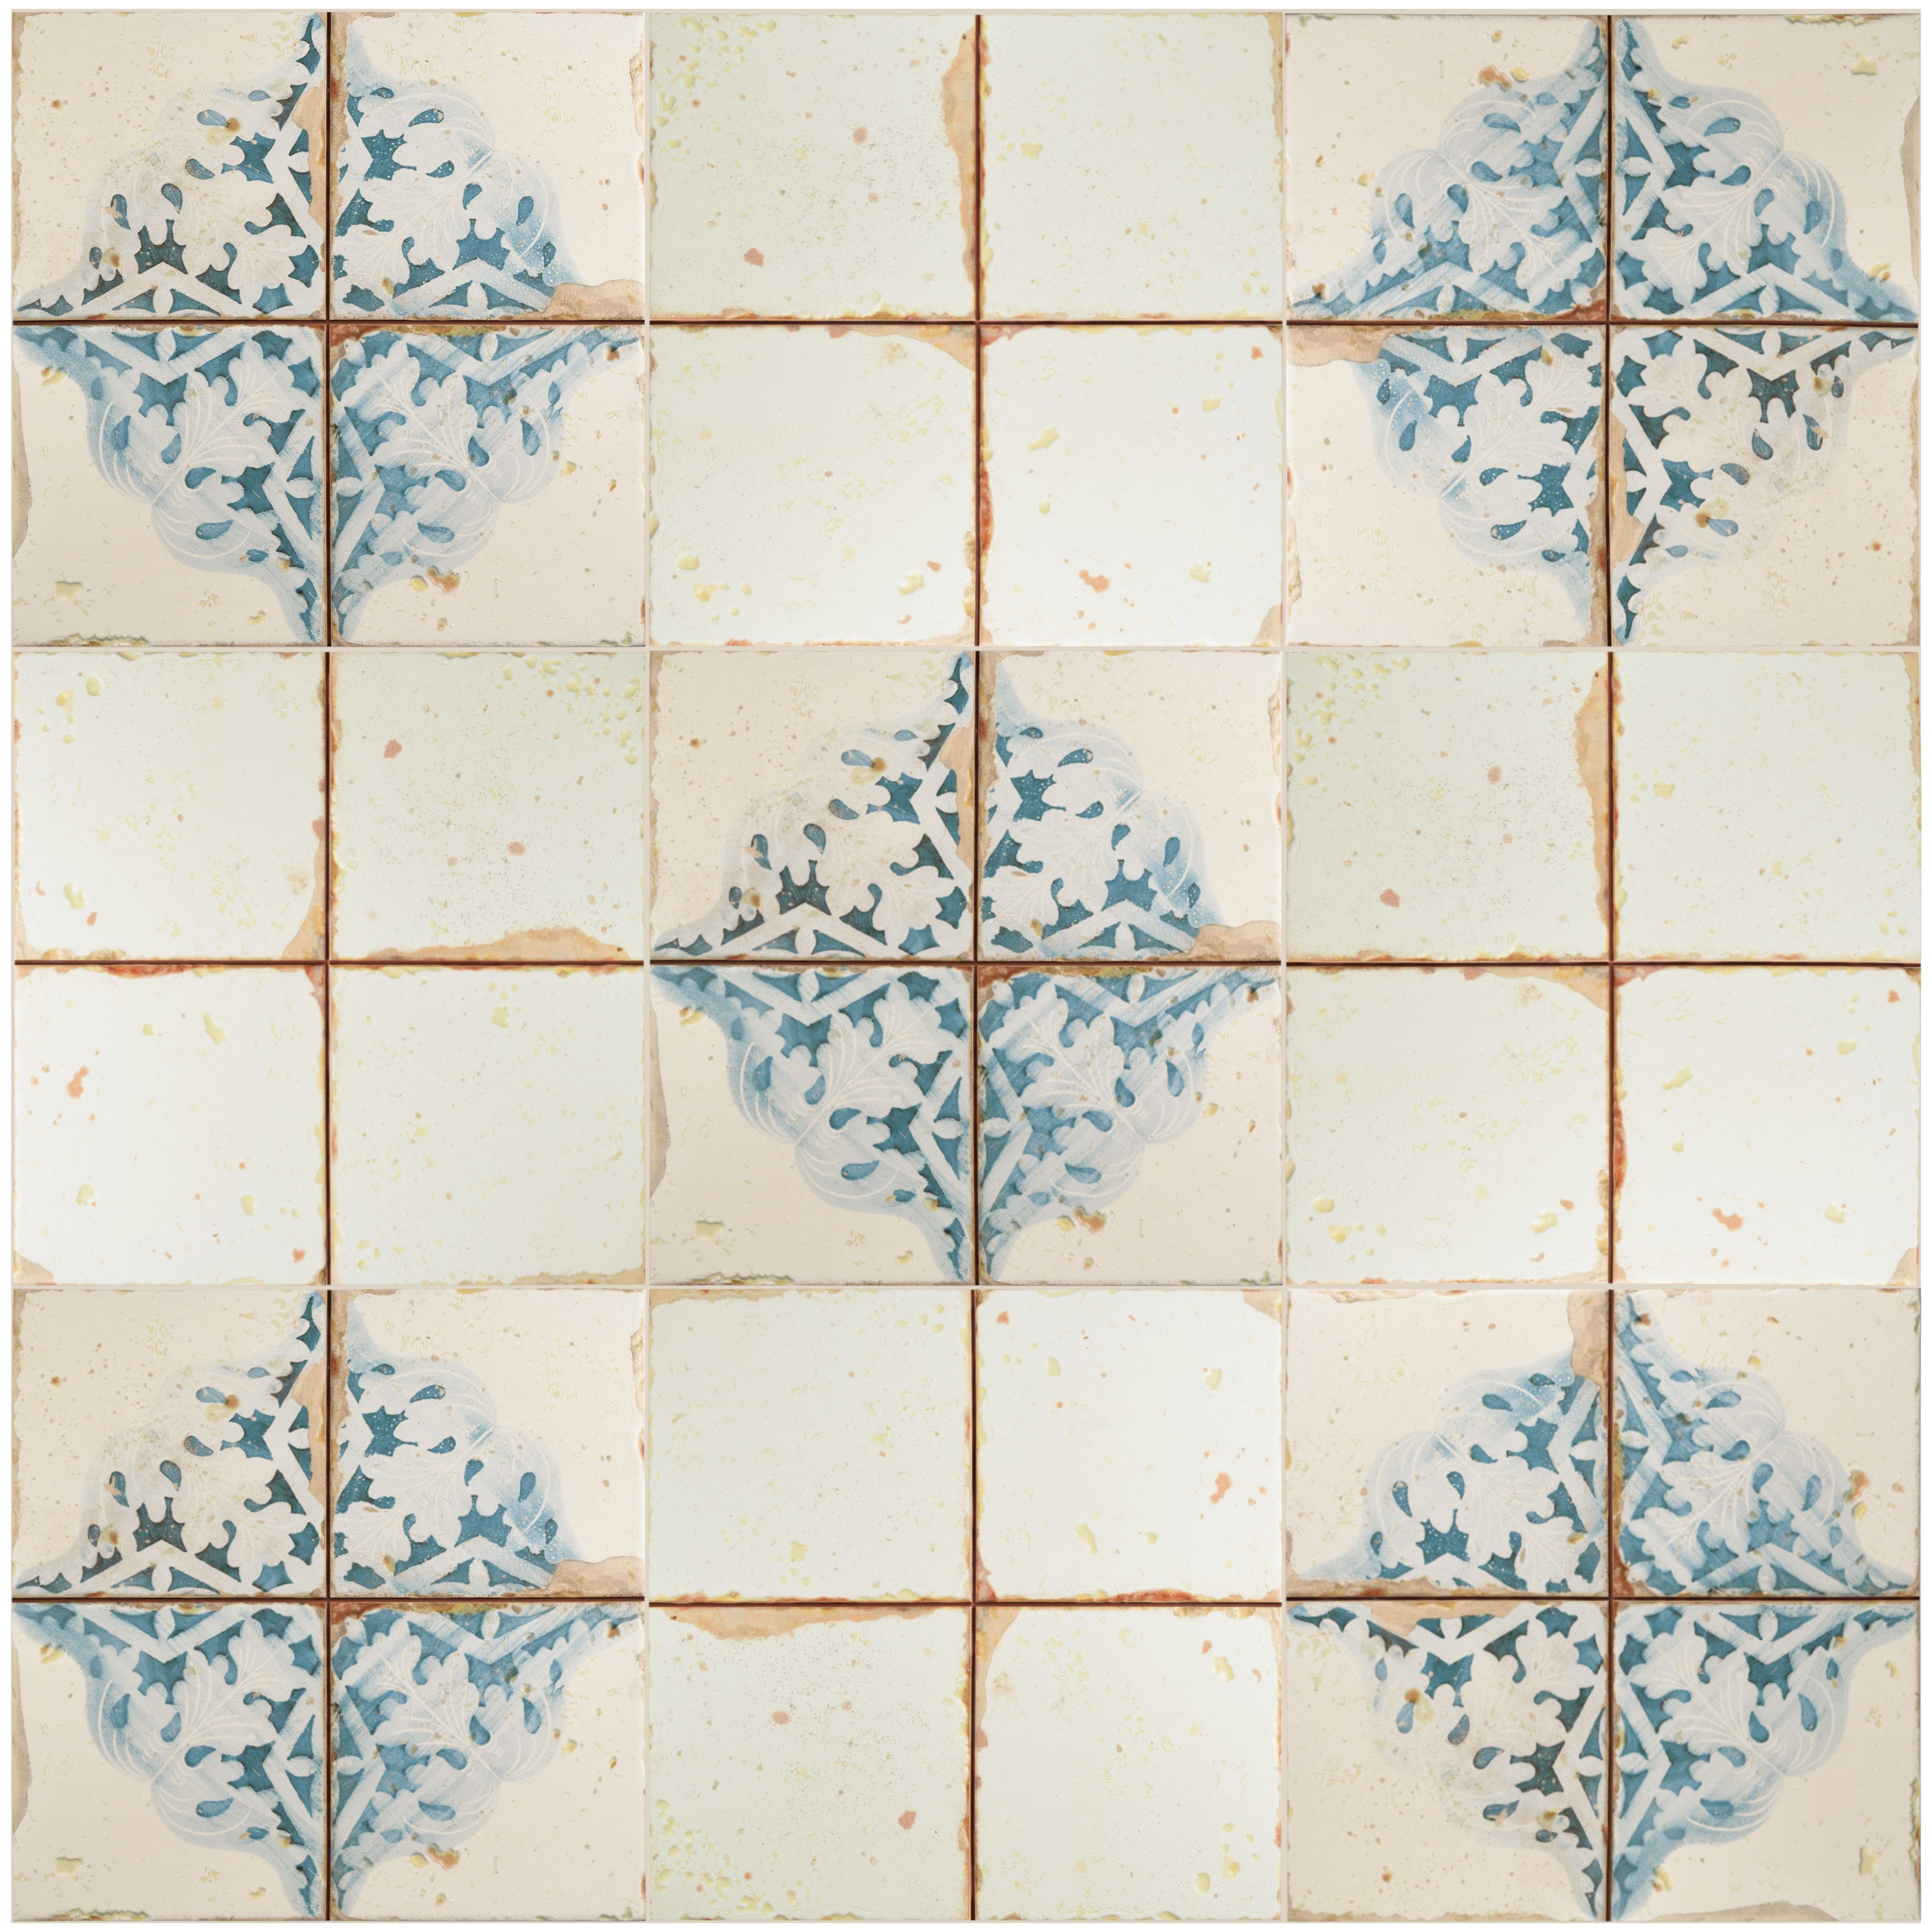 Shop Somertile 13x13 Inch Artesano Azul Decor Ceramic Floor And Wall